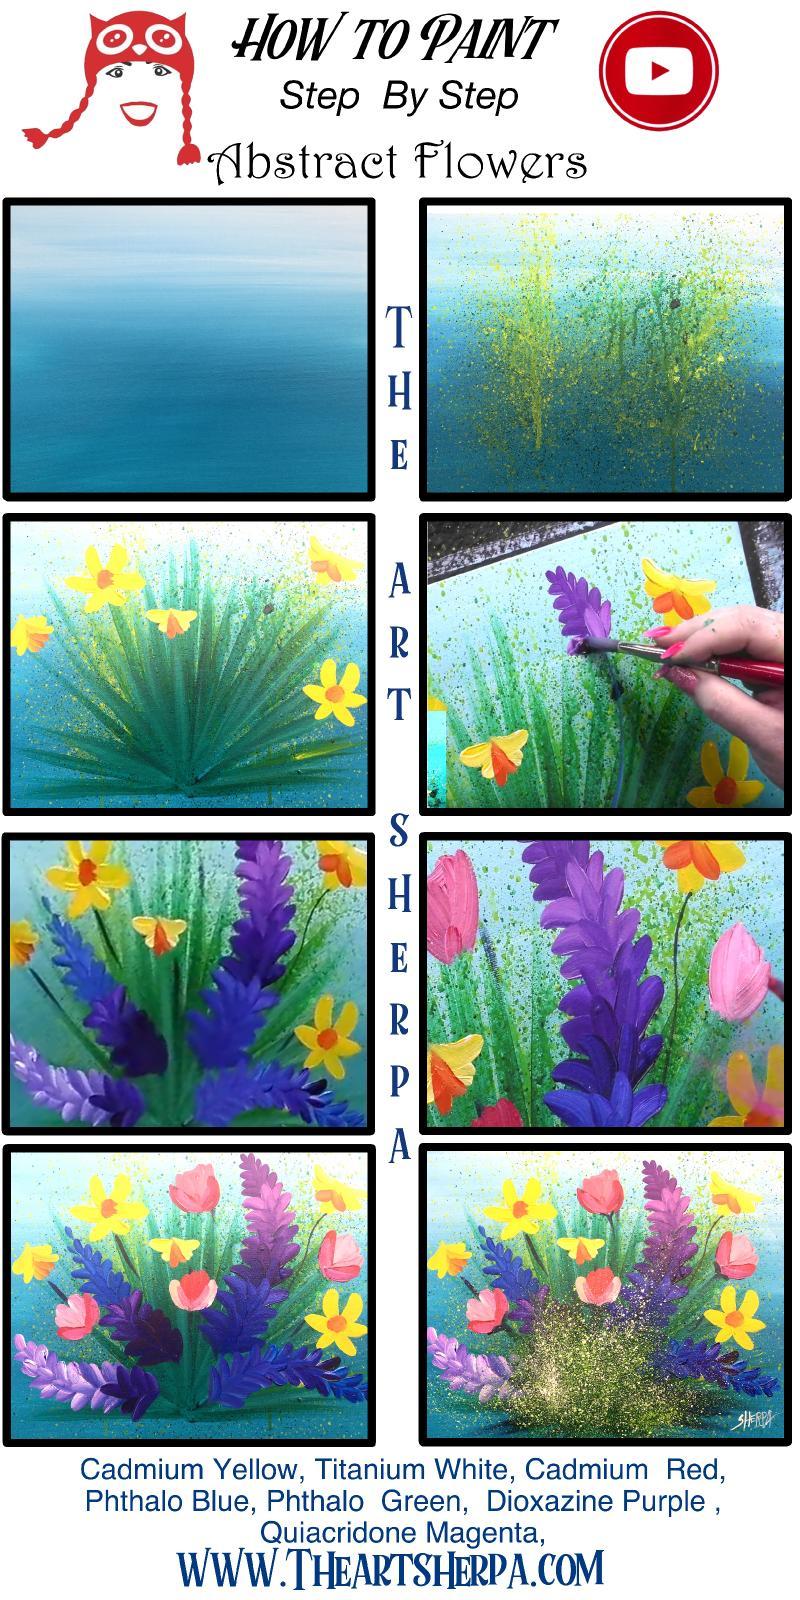 horizontal and Verticle Step by Step 2020 Splashy Flowers .jpg